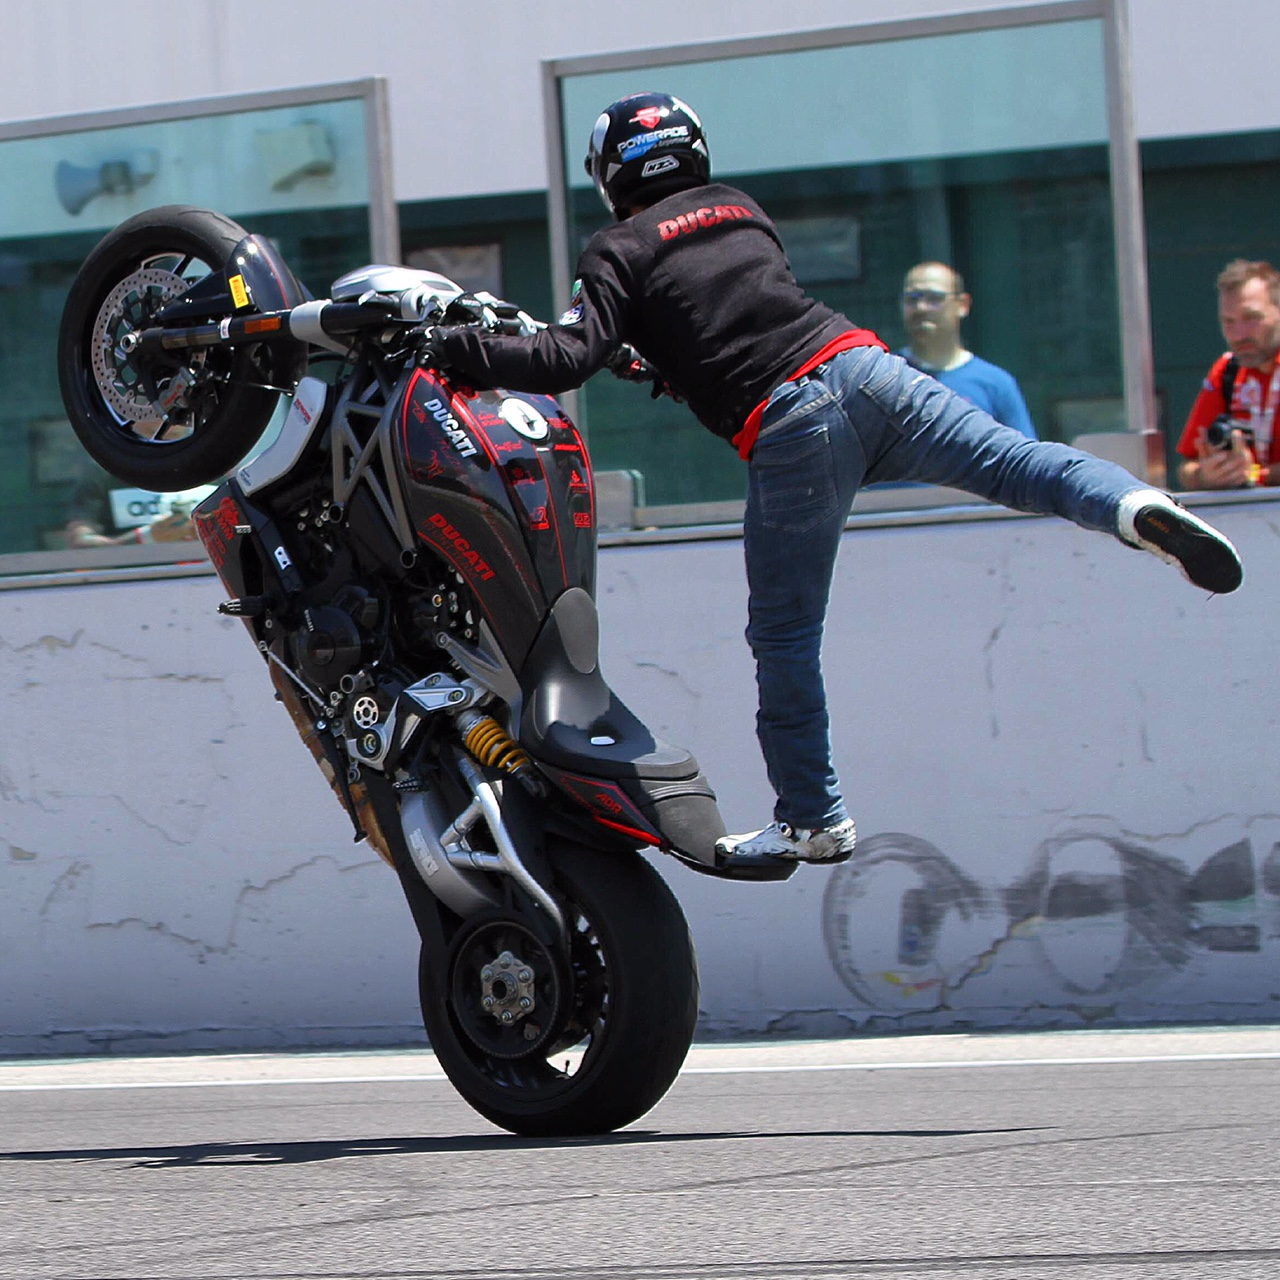 world_ducati_week_2016_wdw_stunt_team_moto_show_motor_exhibicion_espectaculo_ducatistas_doc_misano_italy_italia_rimini_wheelie_stoppie_burnout_panigale_diavel_monster_freestyle_4